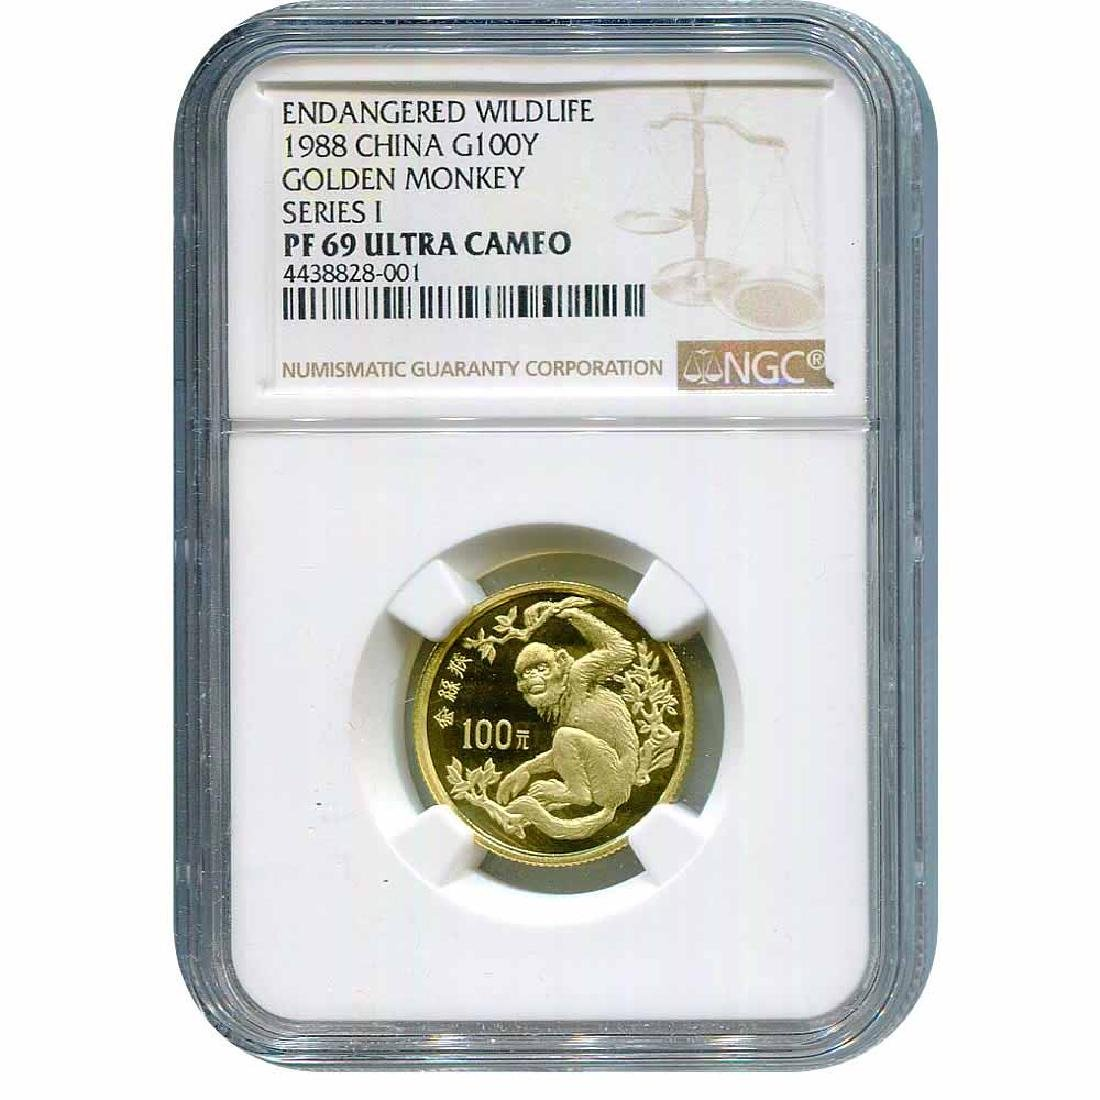 China 100 Yuan Gold 1988 Golden Monkey PF69 NGC